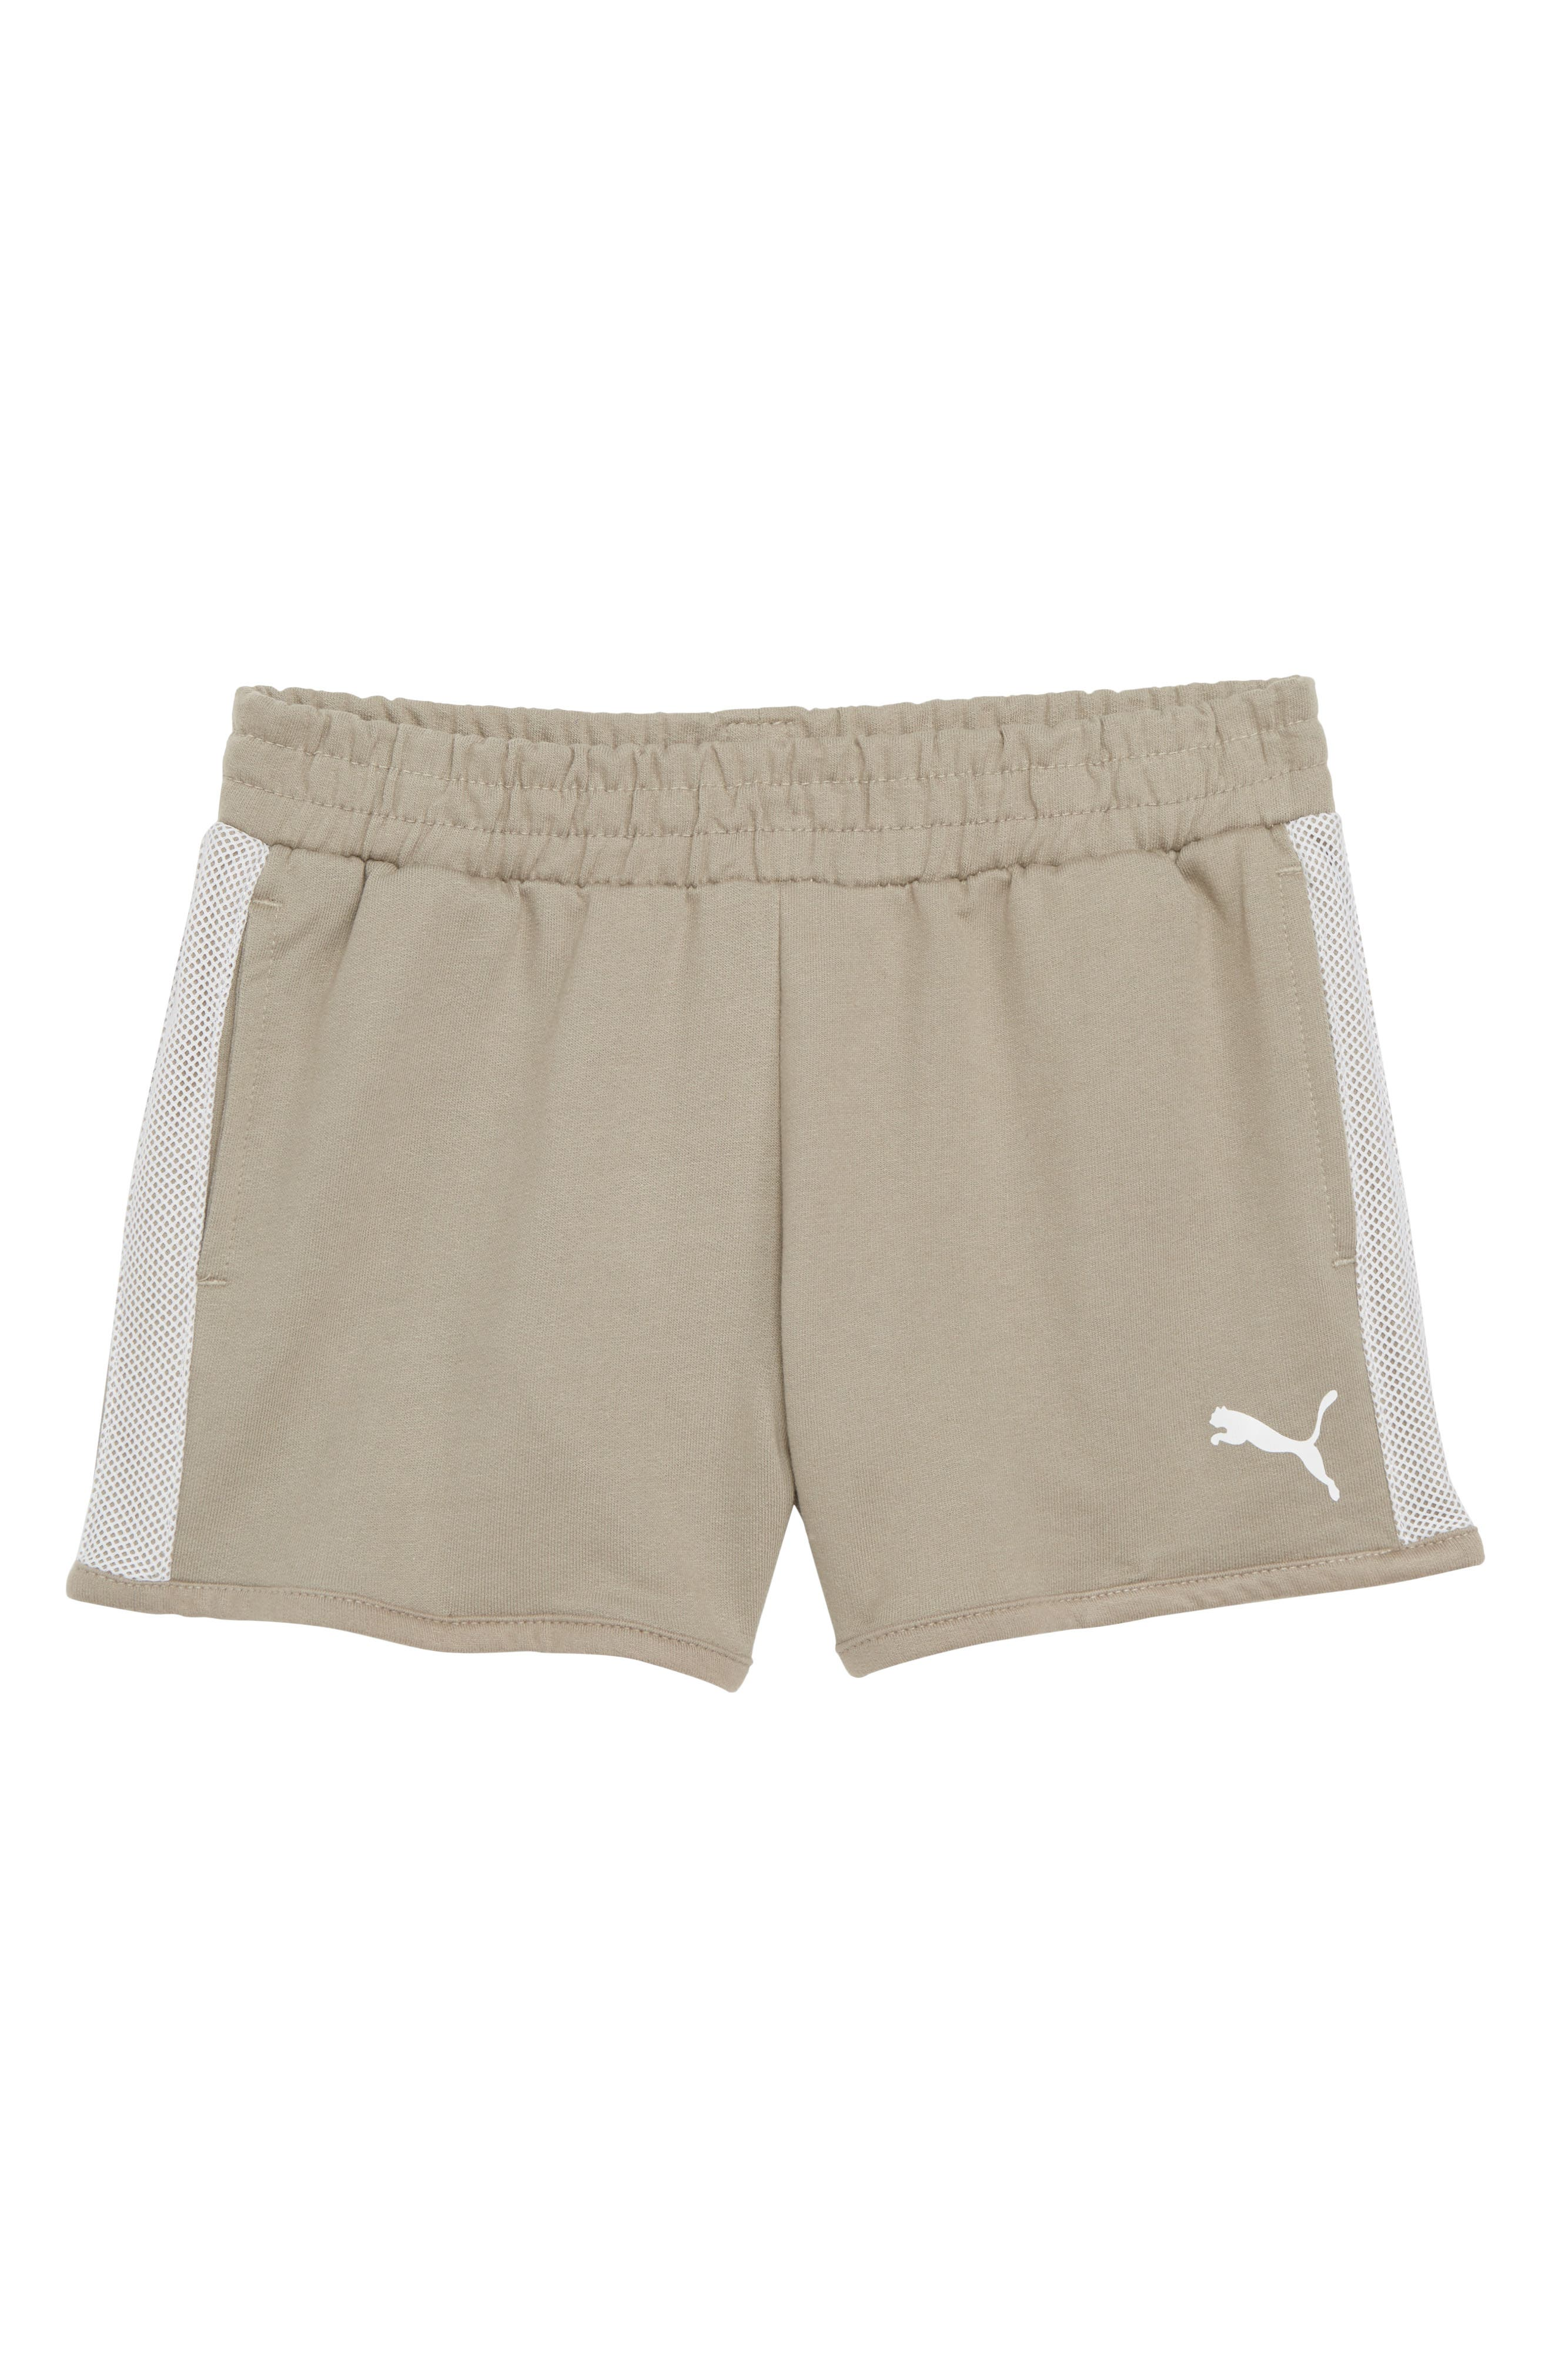 Puma French Terry Shorts (Big Girls)